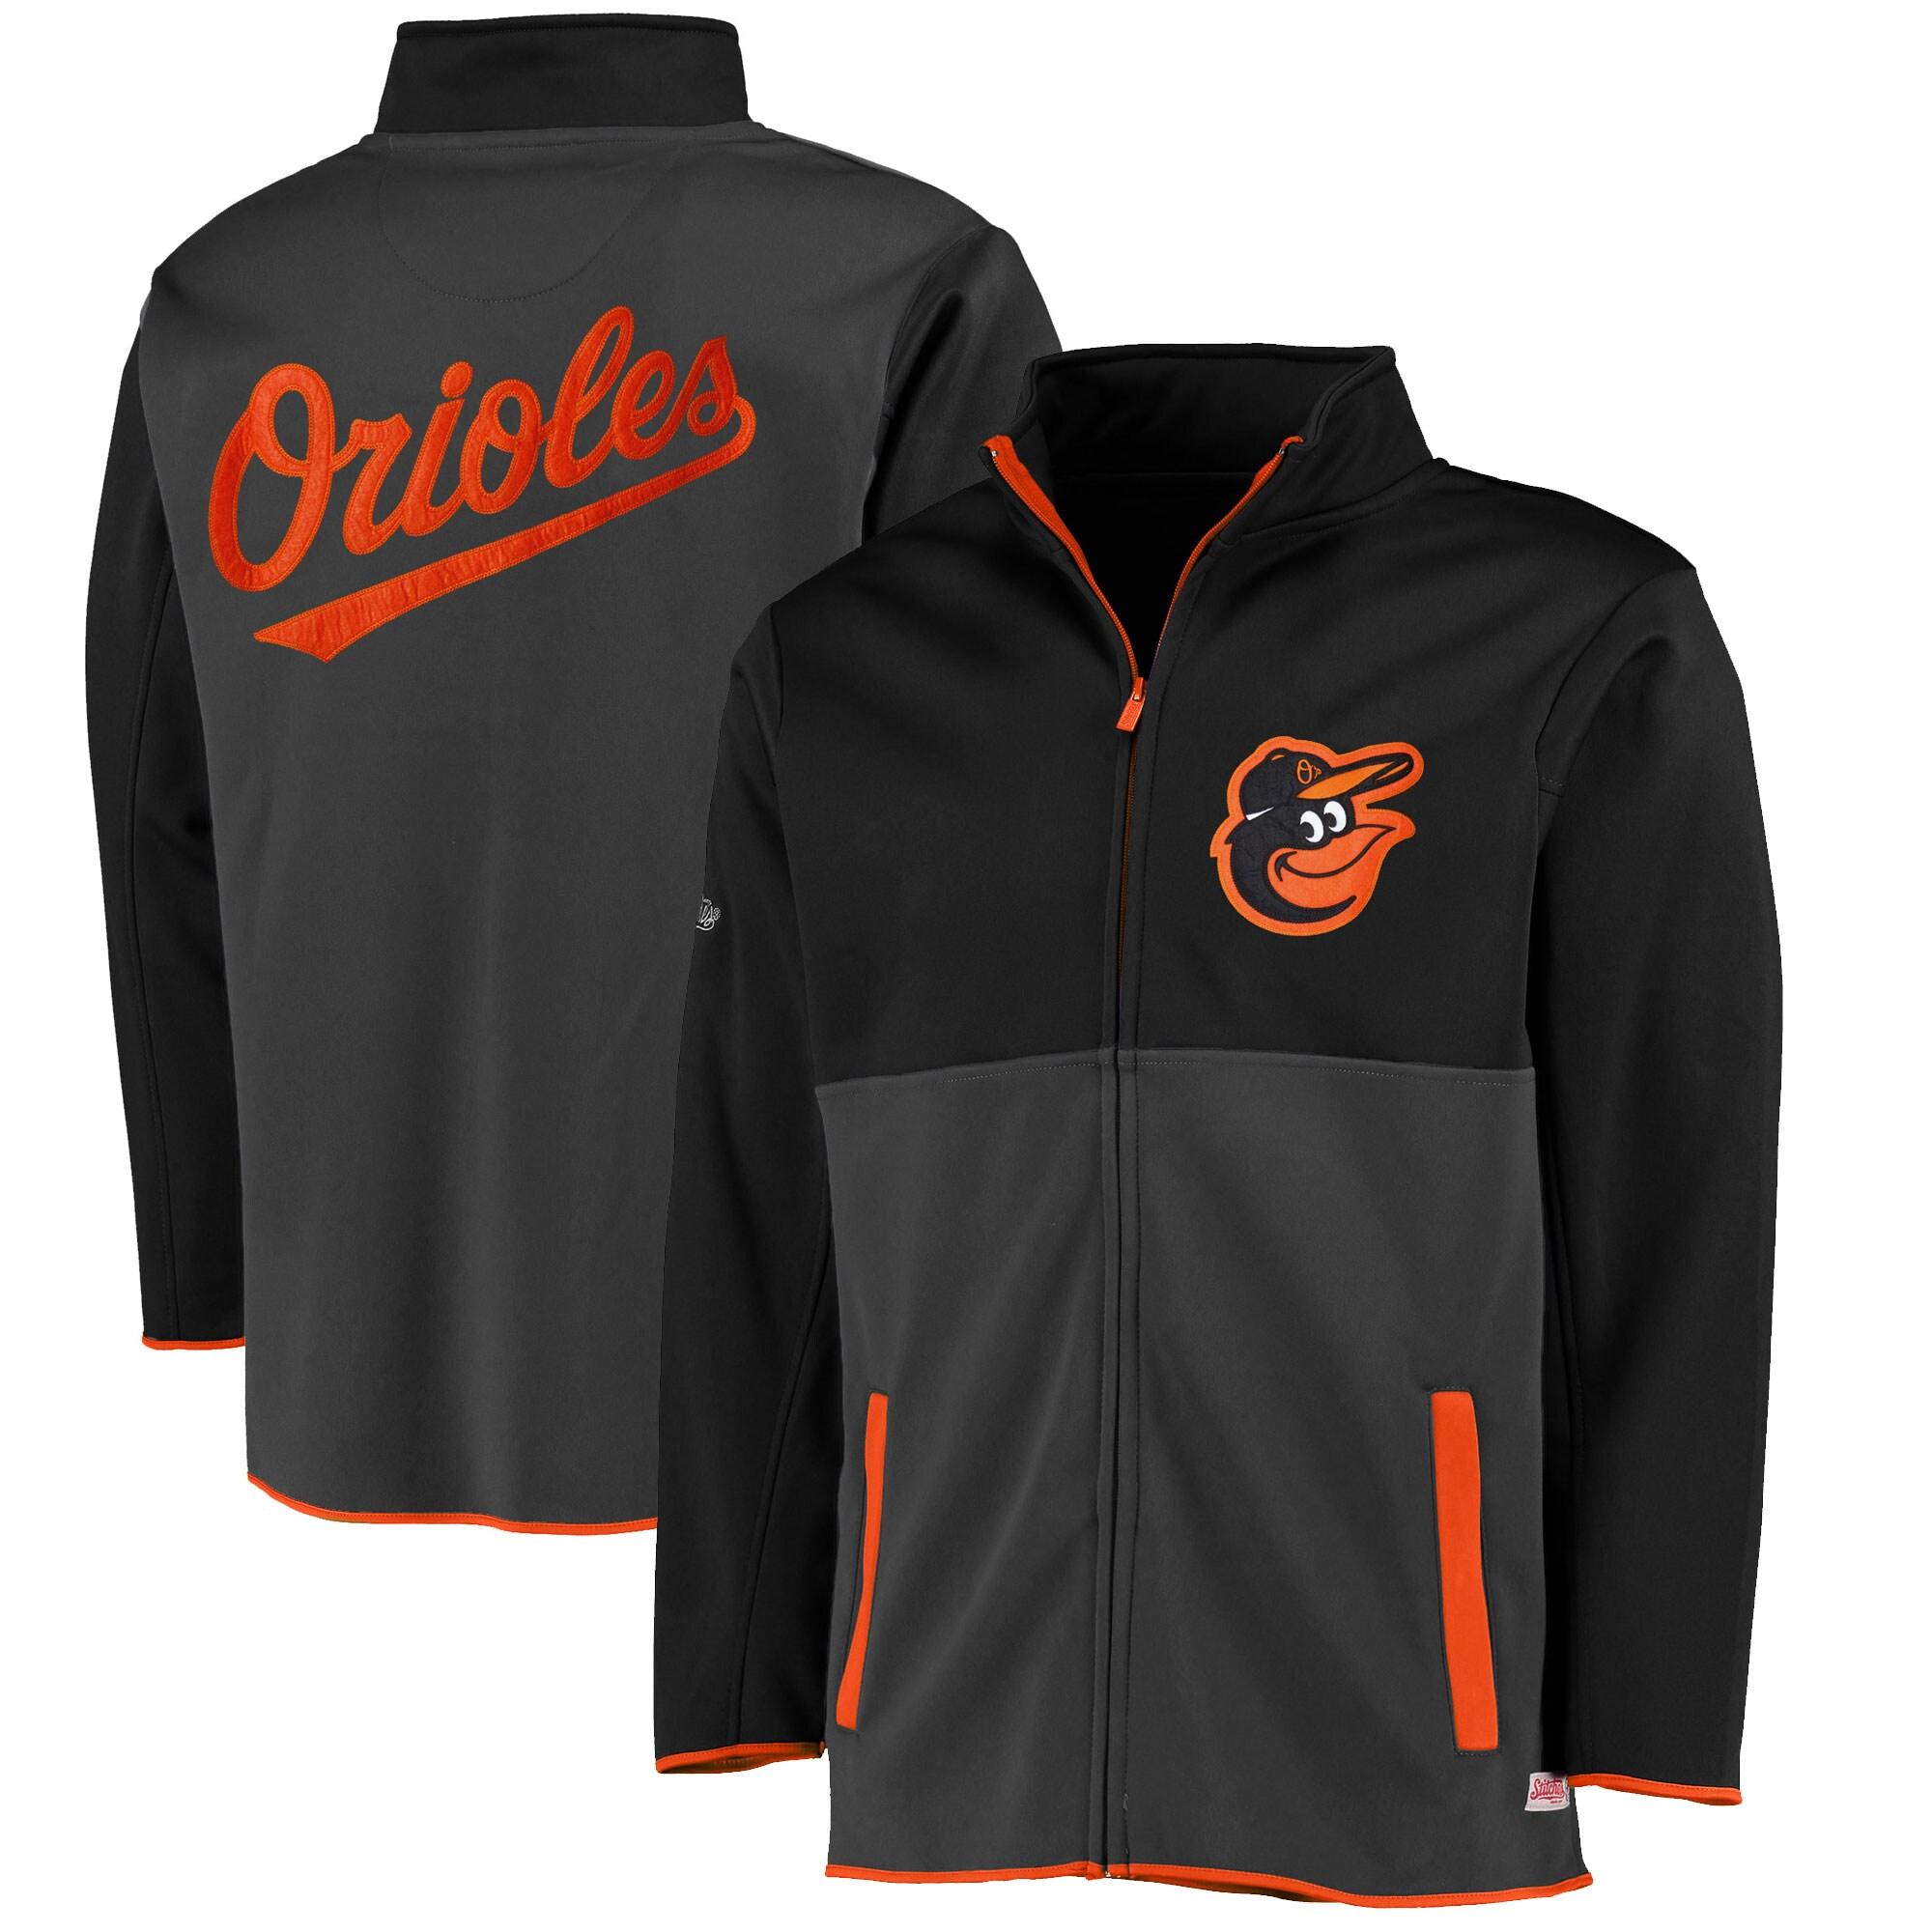 Baltimore Orioles Stitches Fashion Track Jacket - Black